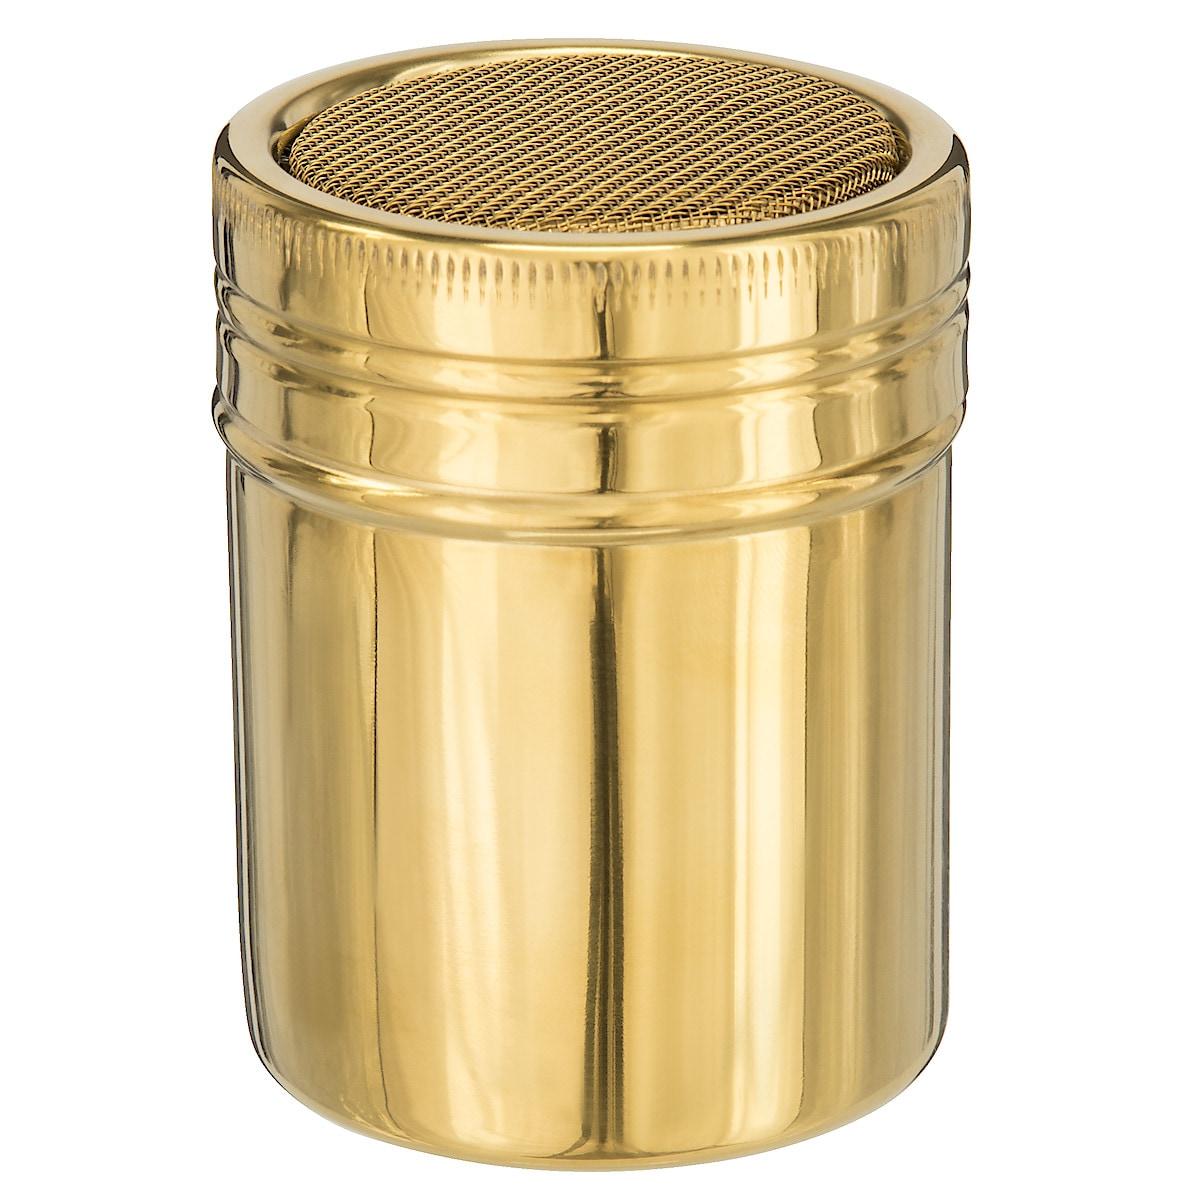 Coline Powder Shaker, Gold